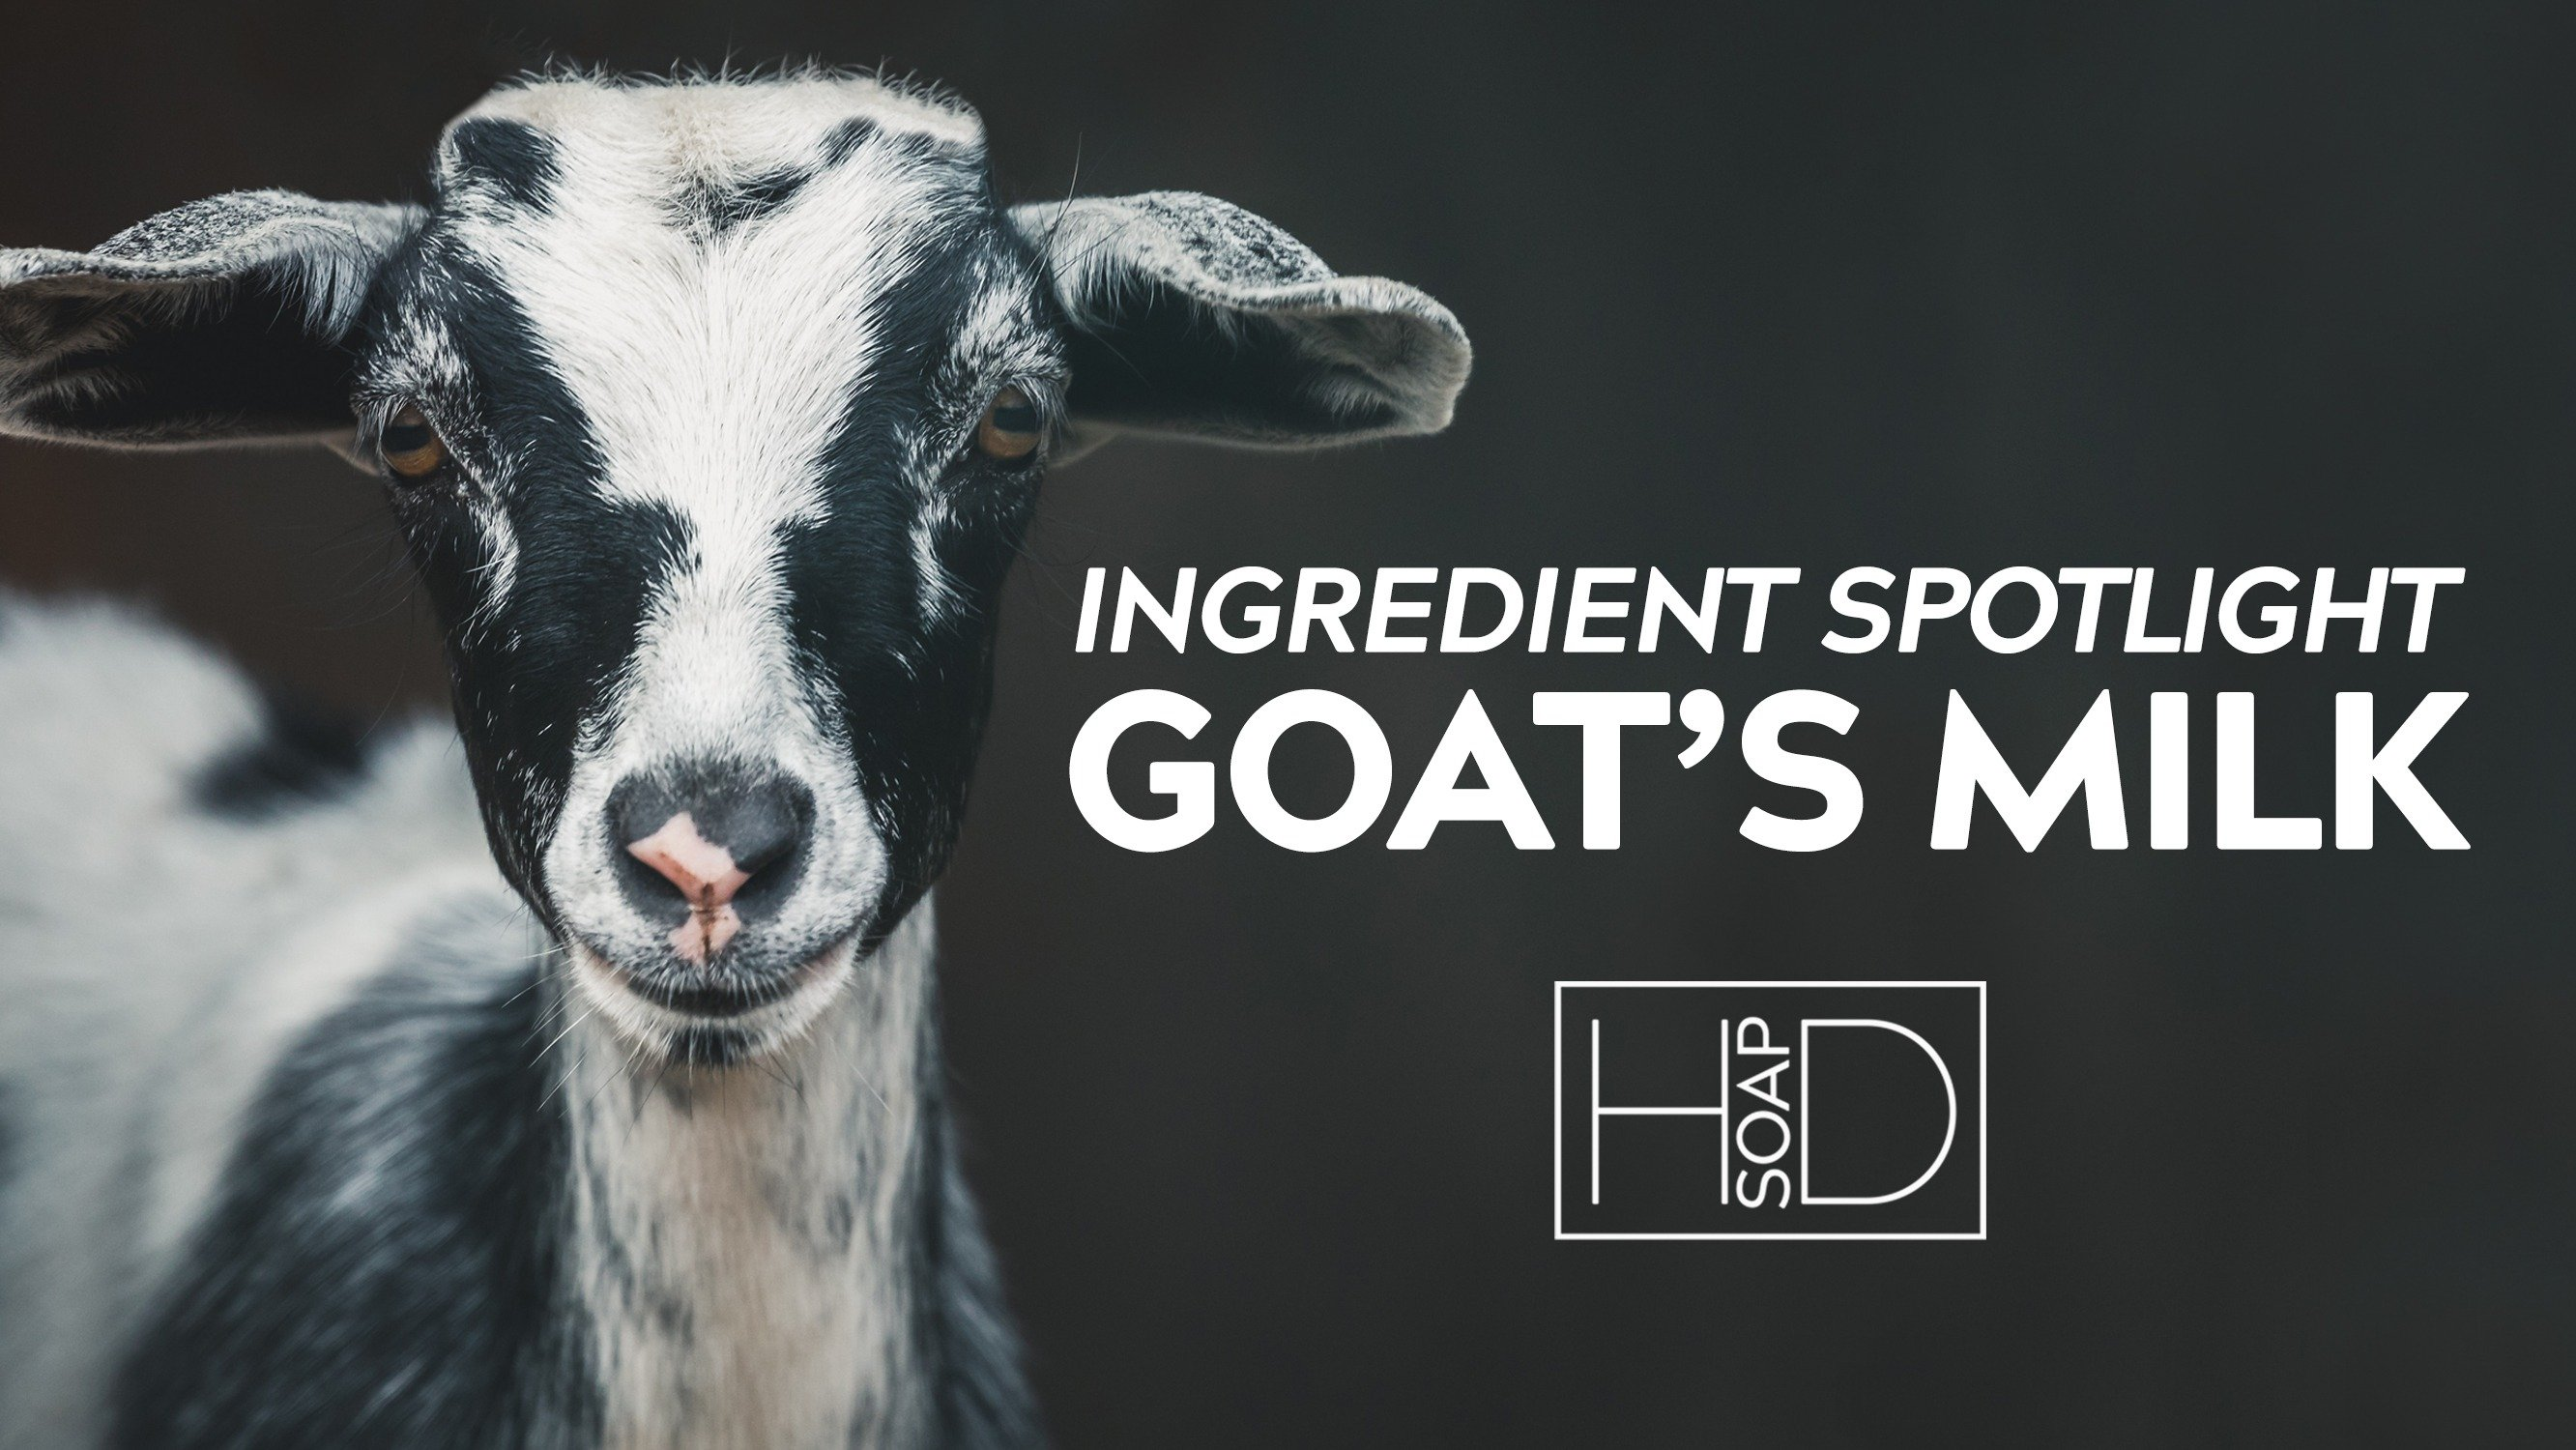 HD Soap | Ingredient Spotlight on Goats Milk